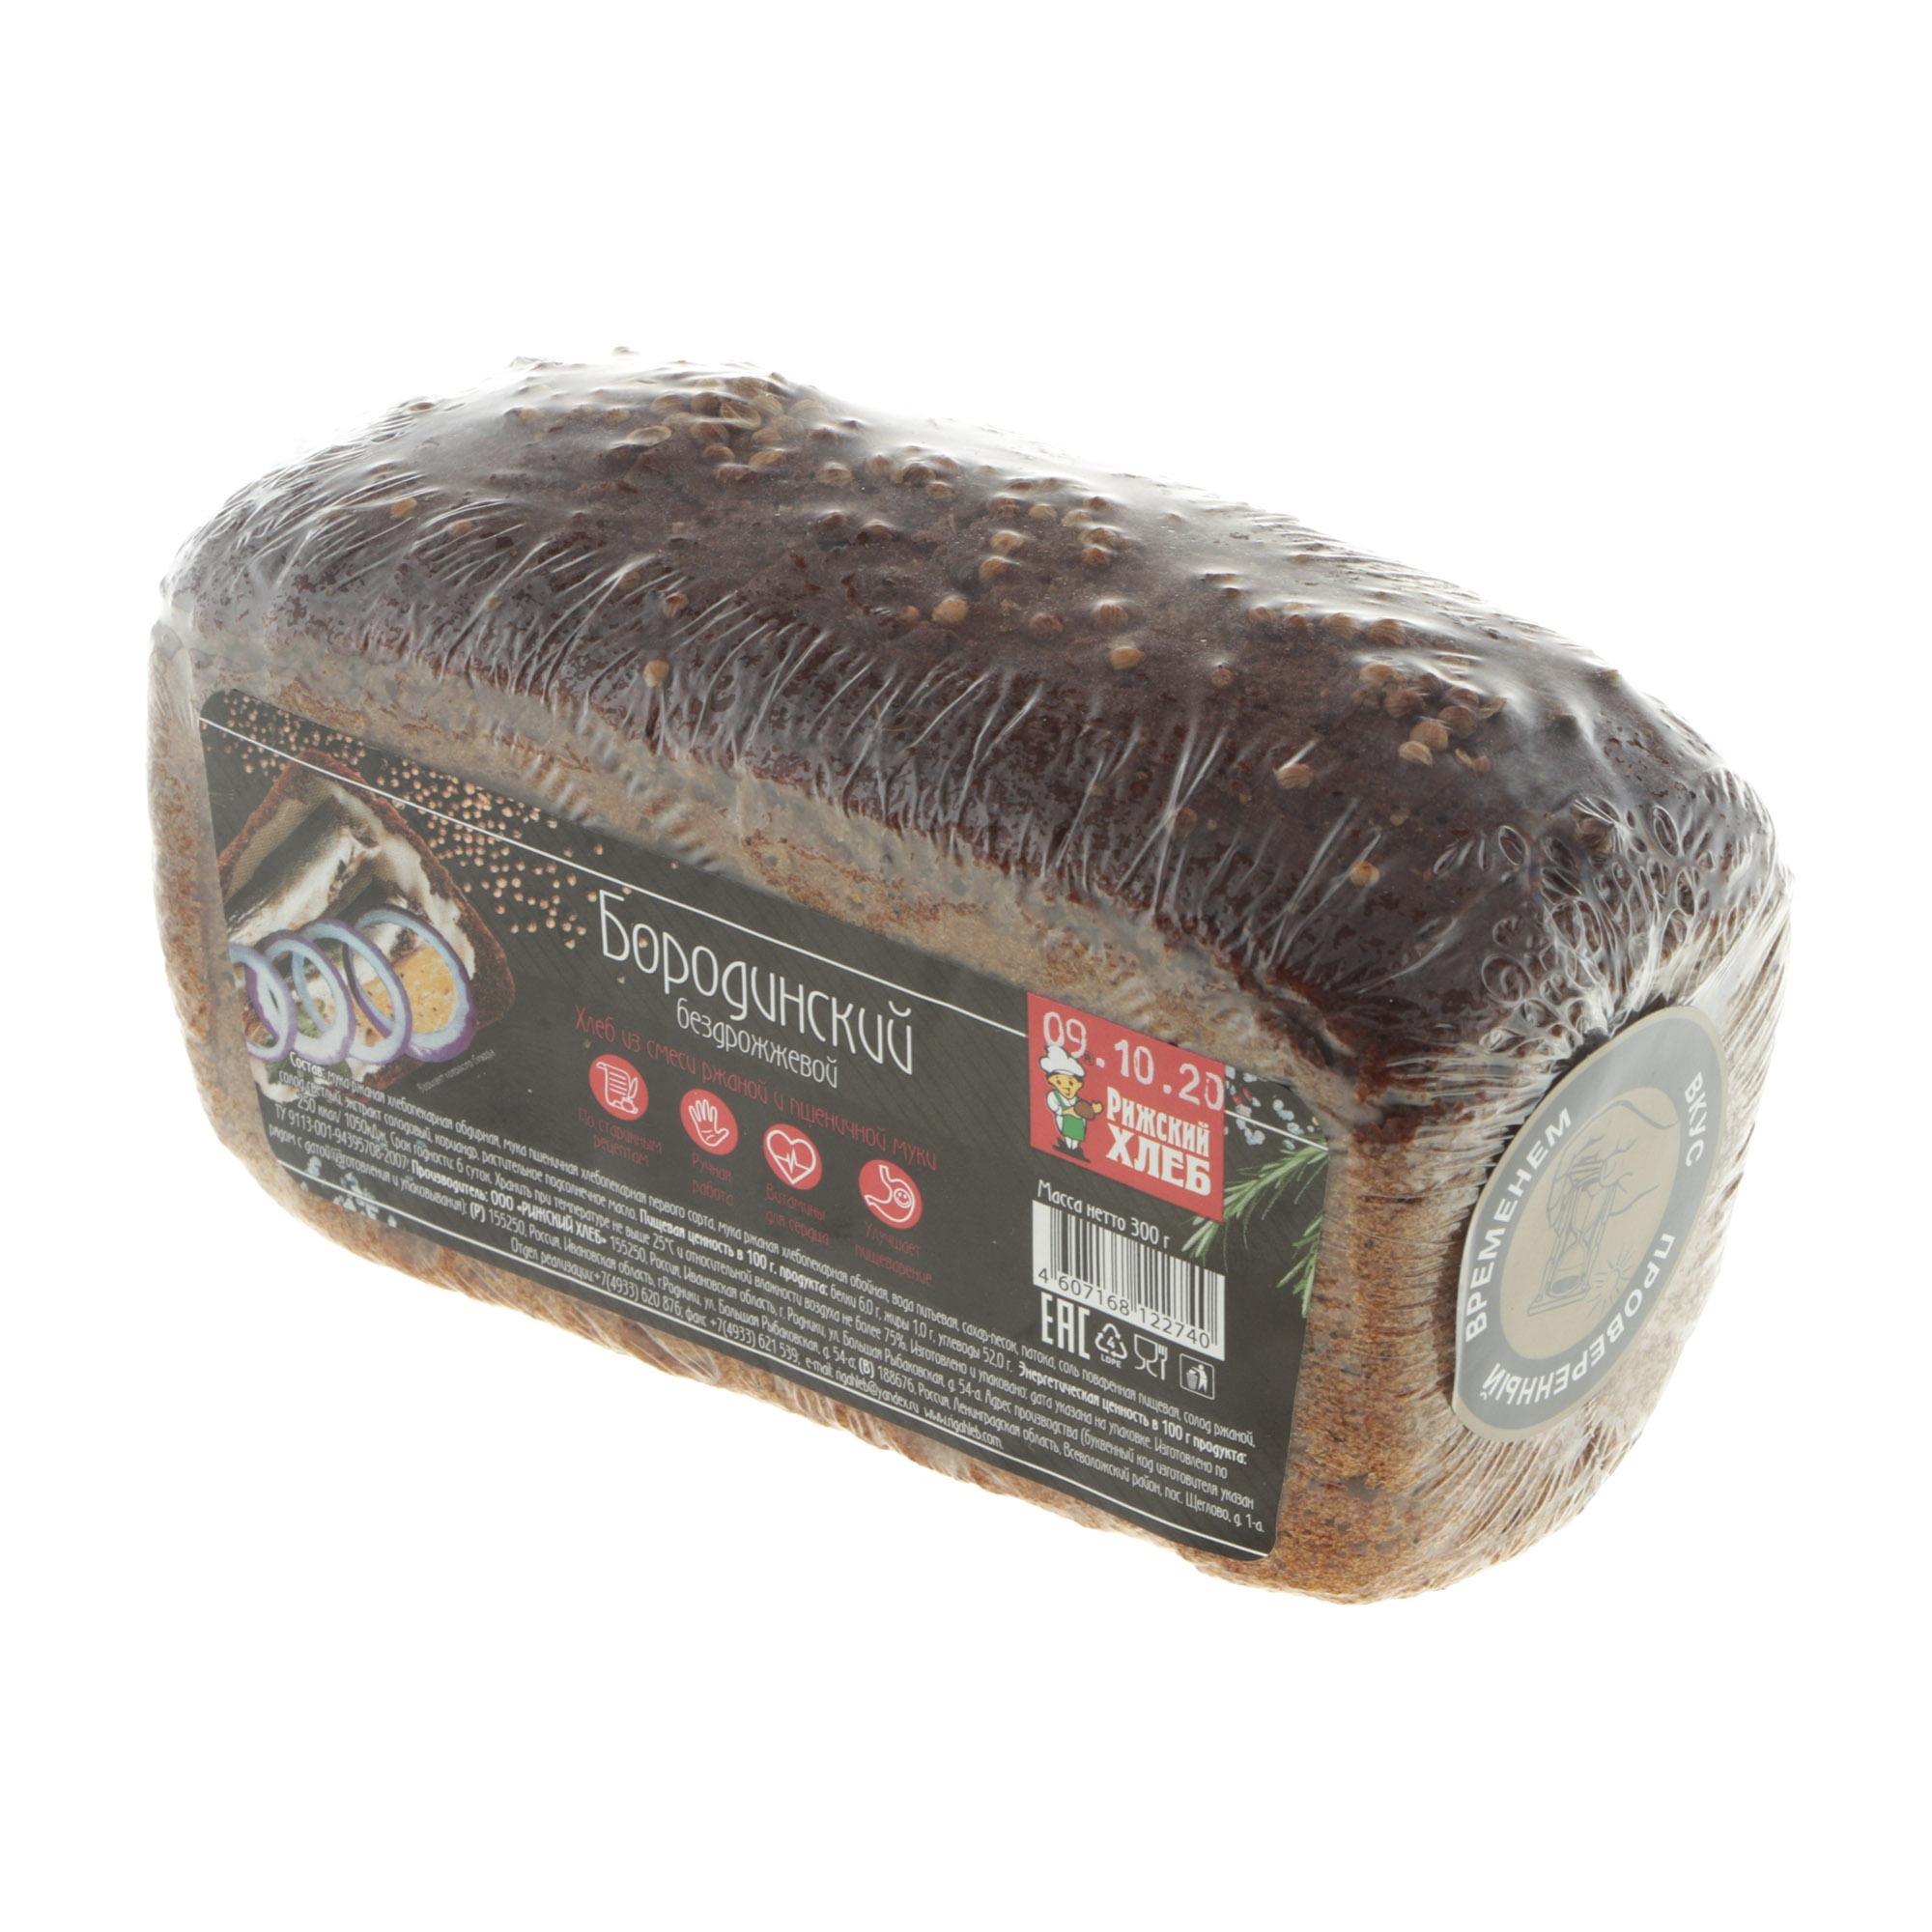 Фото - Хлеб Рижский хлеб бородинский 300 г хлеб черемушки бородинский нарезка 390 г